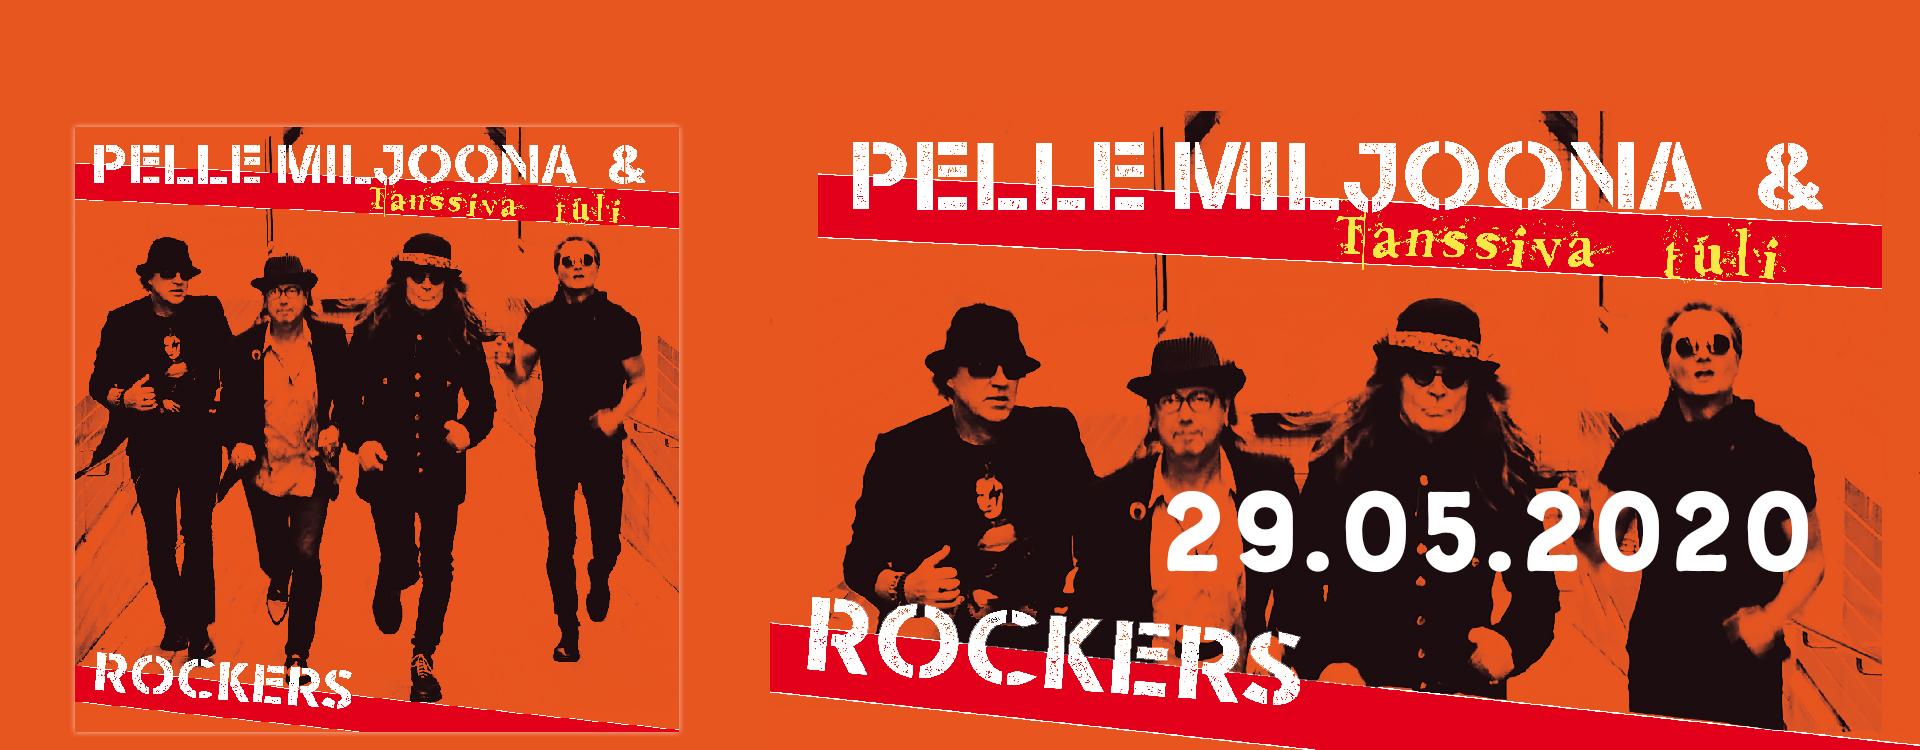 Pelle Miljoona & Rockers - Tanssiva tuli